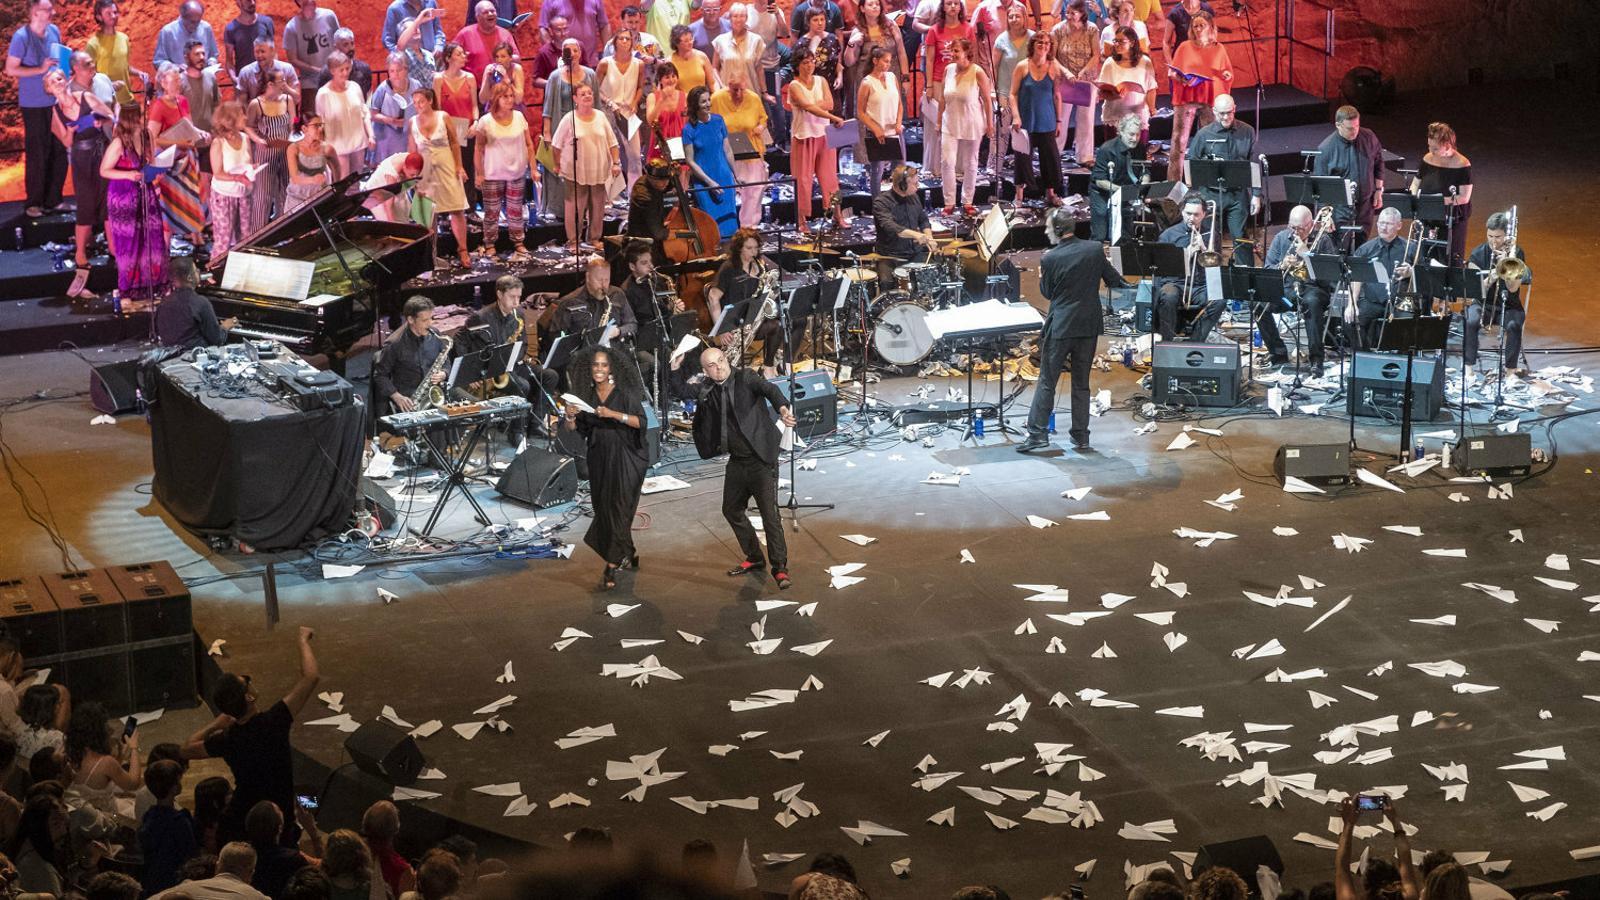 Música europeista per apaivagar el brogit del Brexit